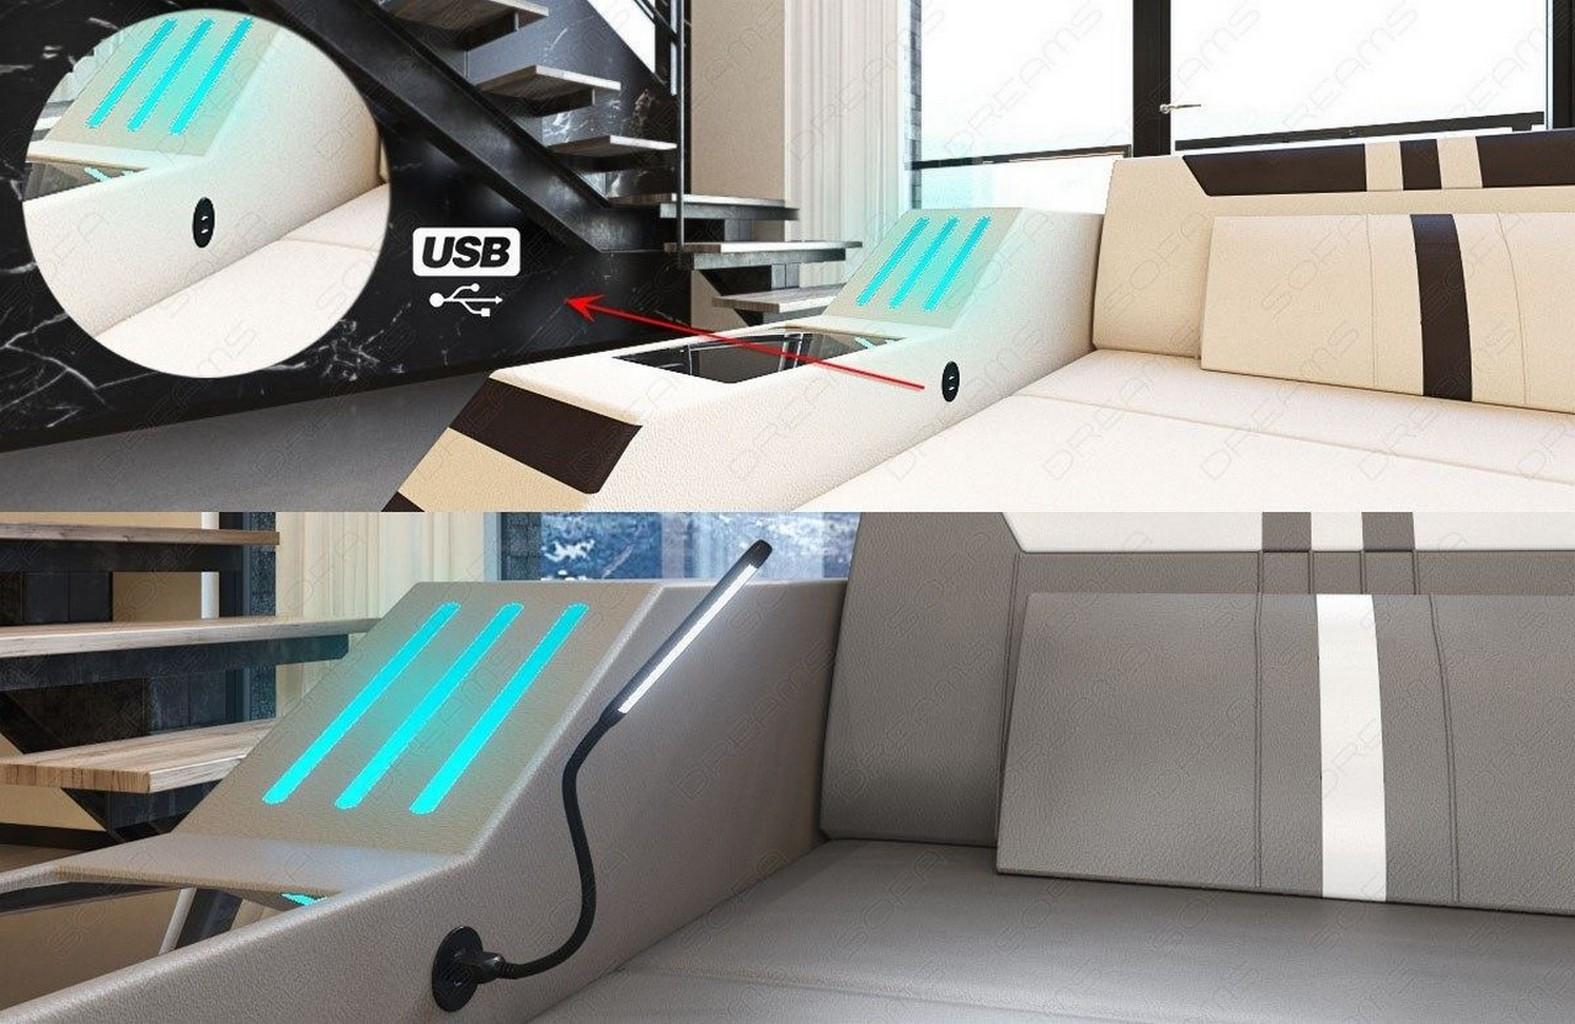 leather sectional sofa ravenna u shape corner sofa led. Black Bedroom Furniture Sets. Home Design Ideas